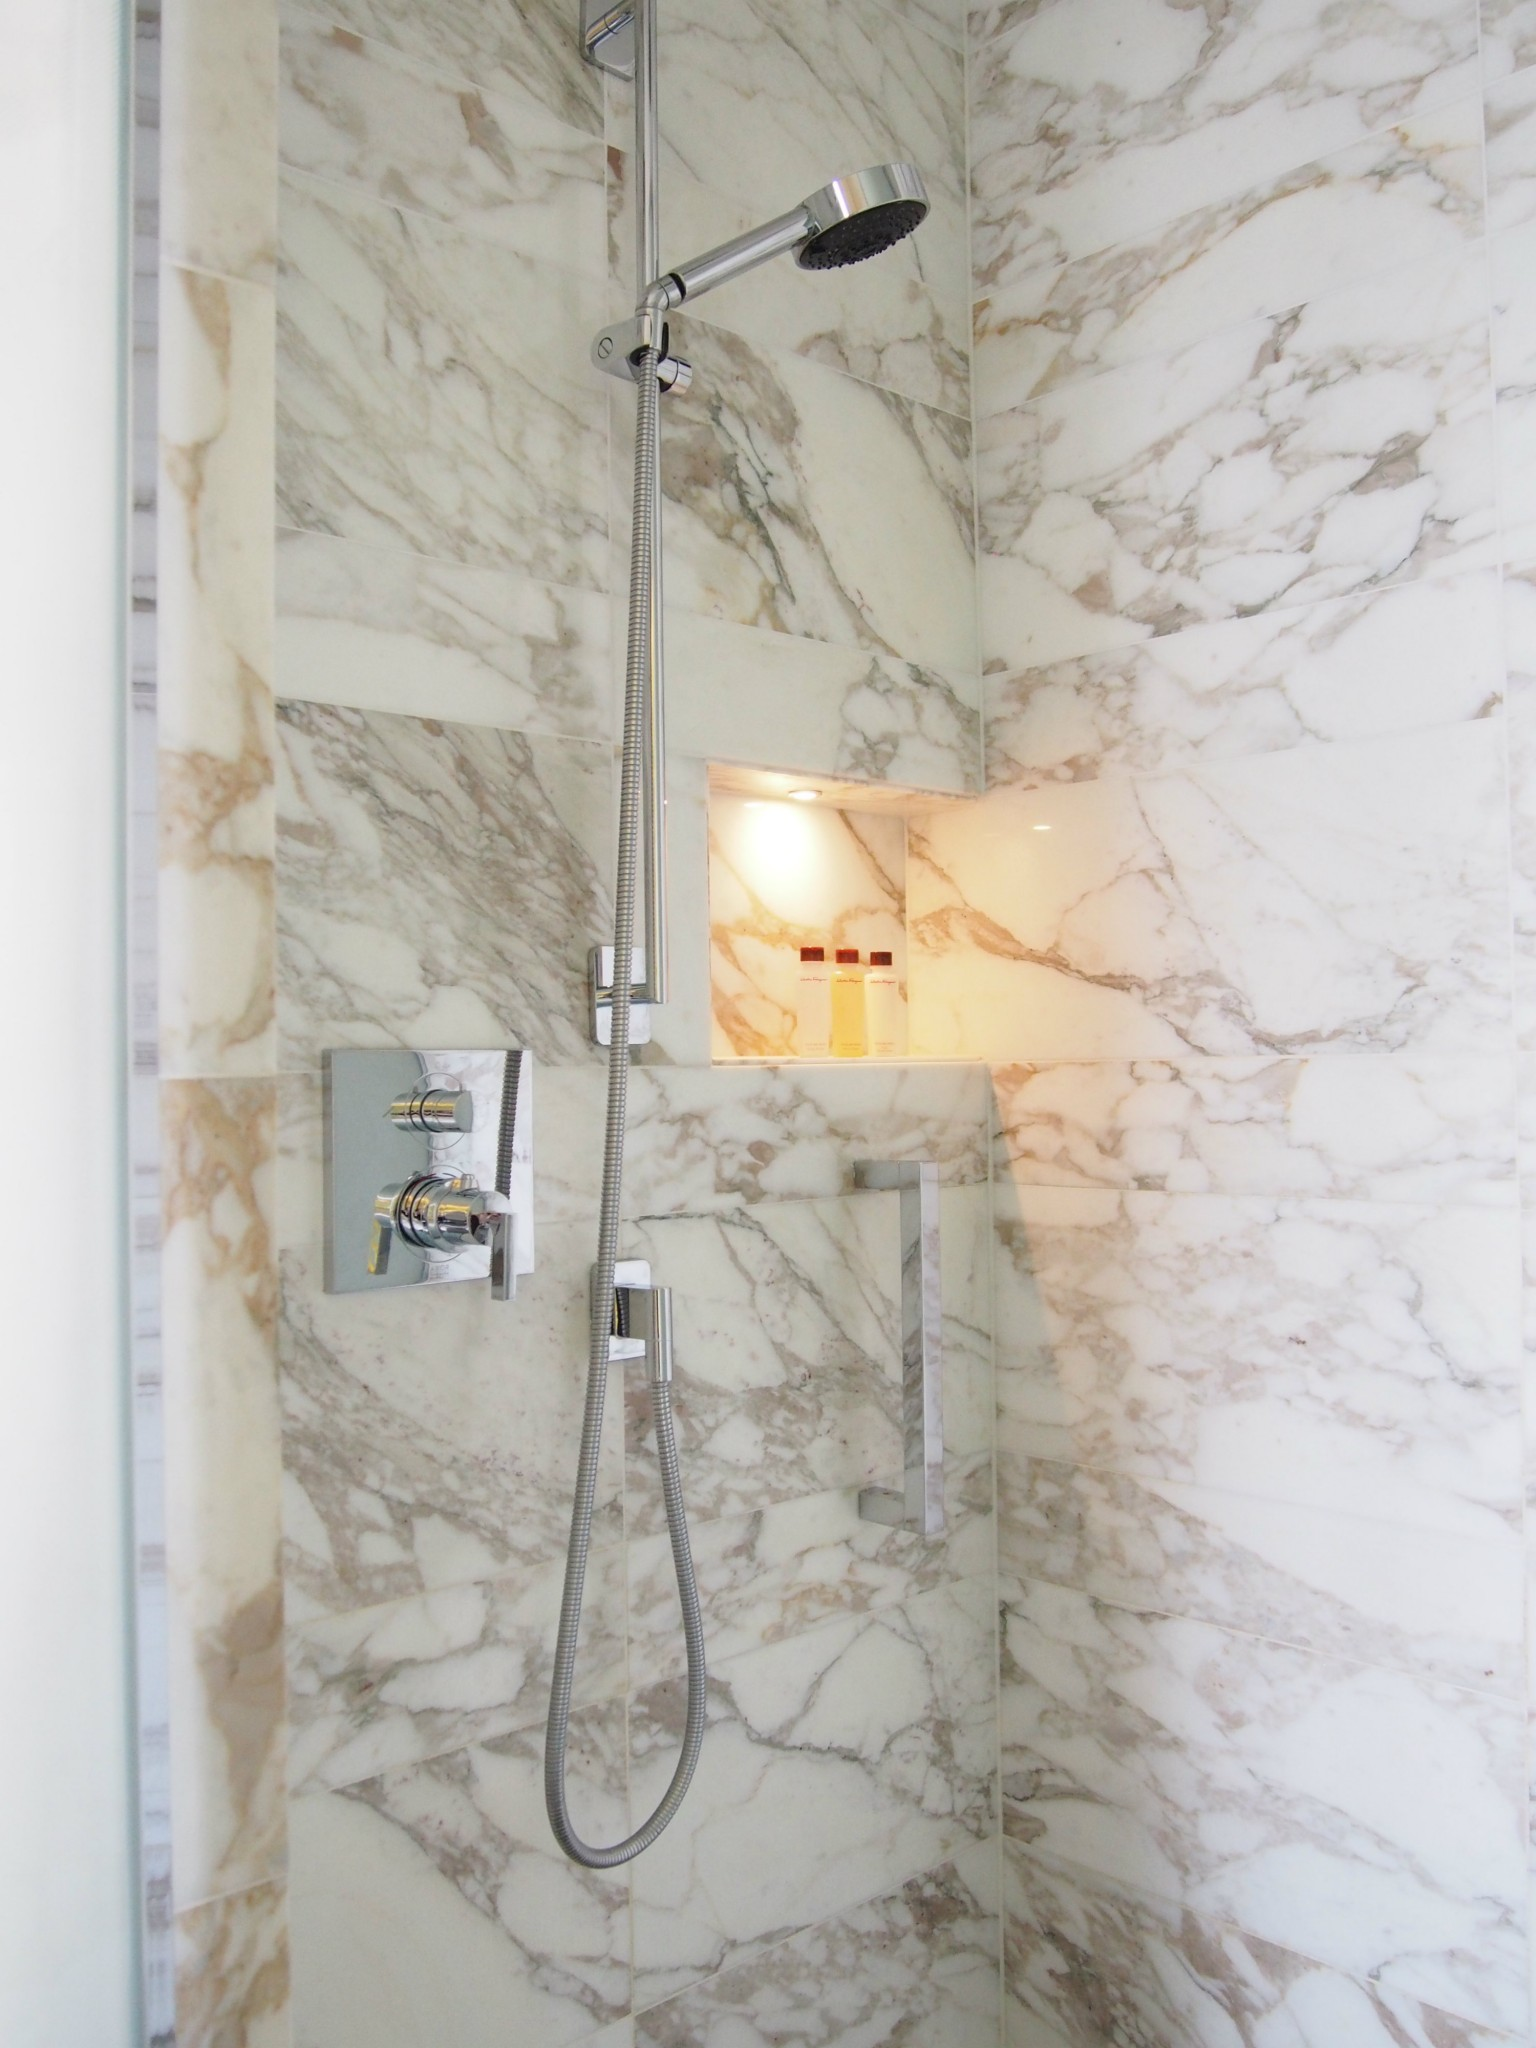 Waldorf Astoria Berlin king junior suite kylpyhuone 5